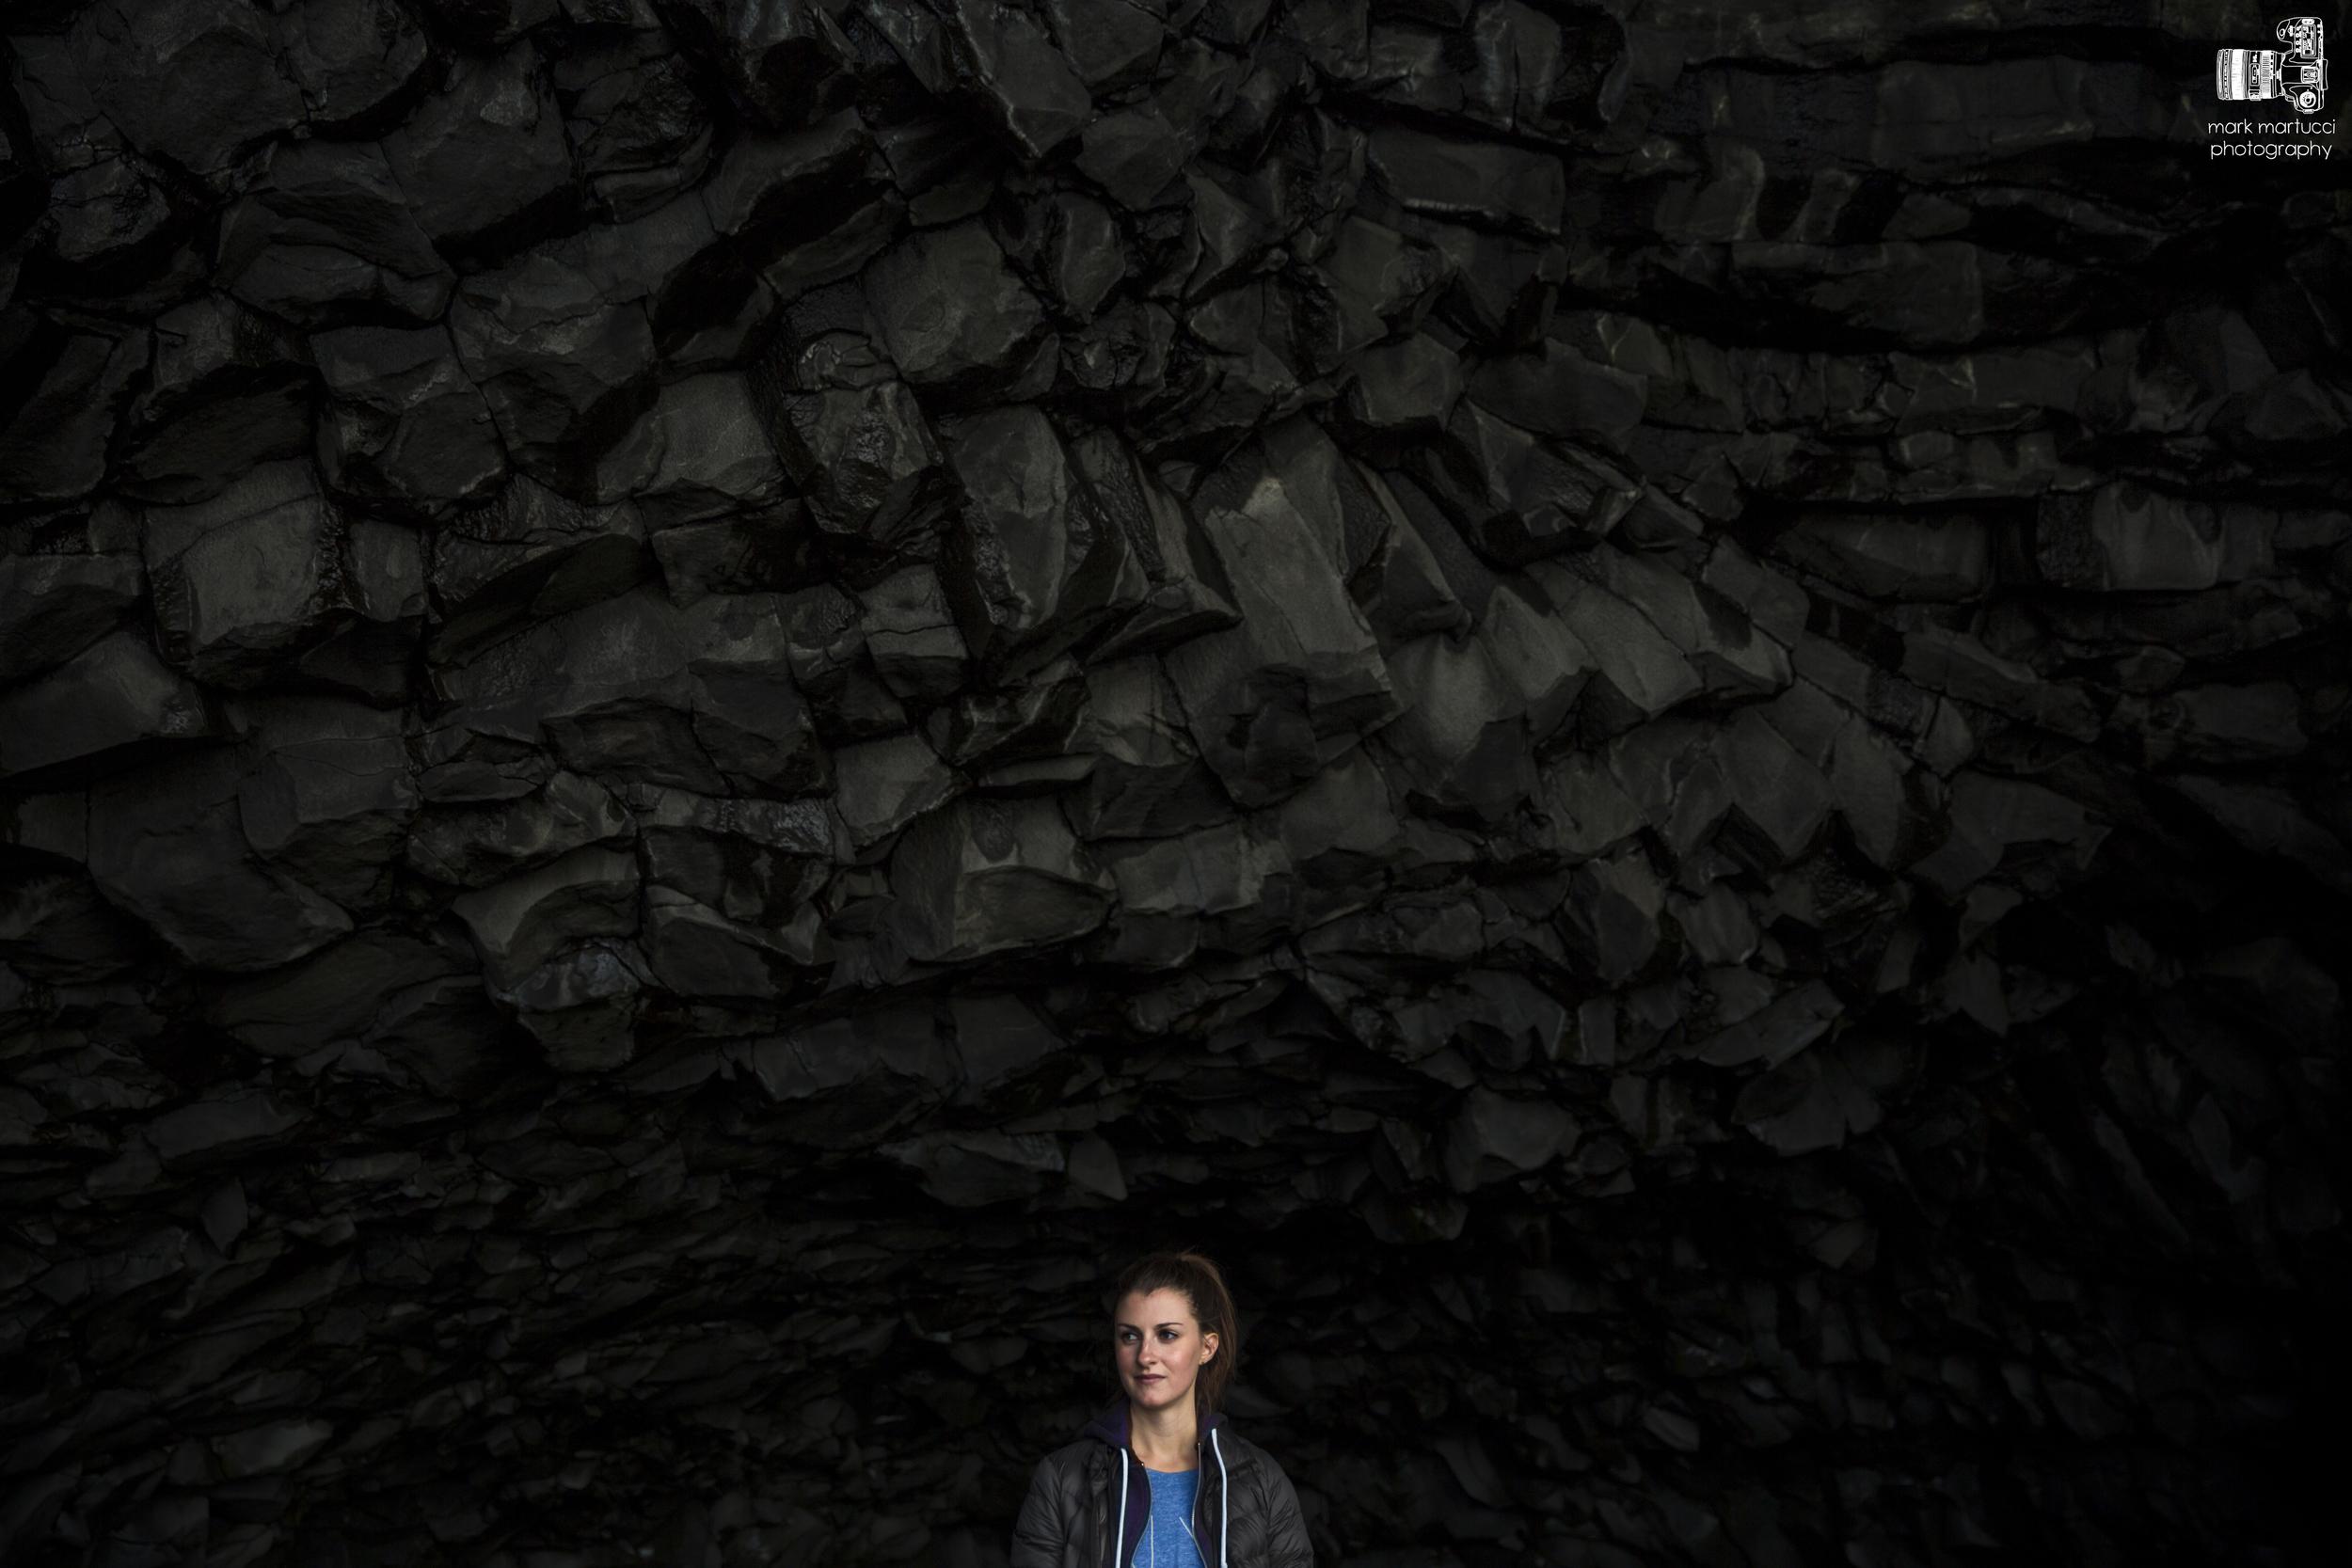 Iceland_1719.jpg